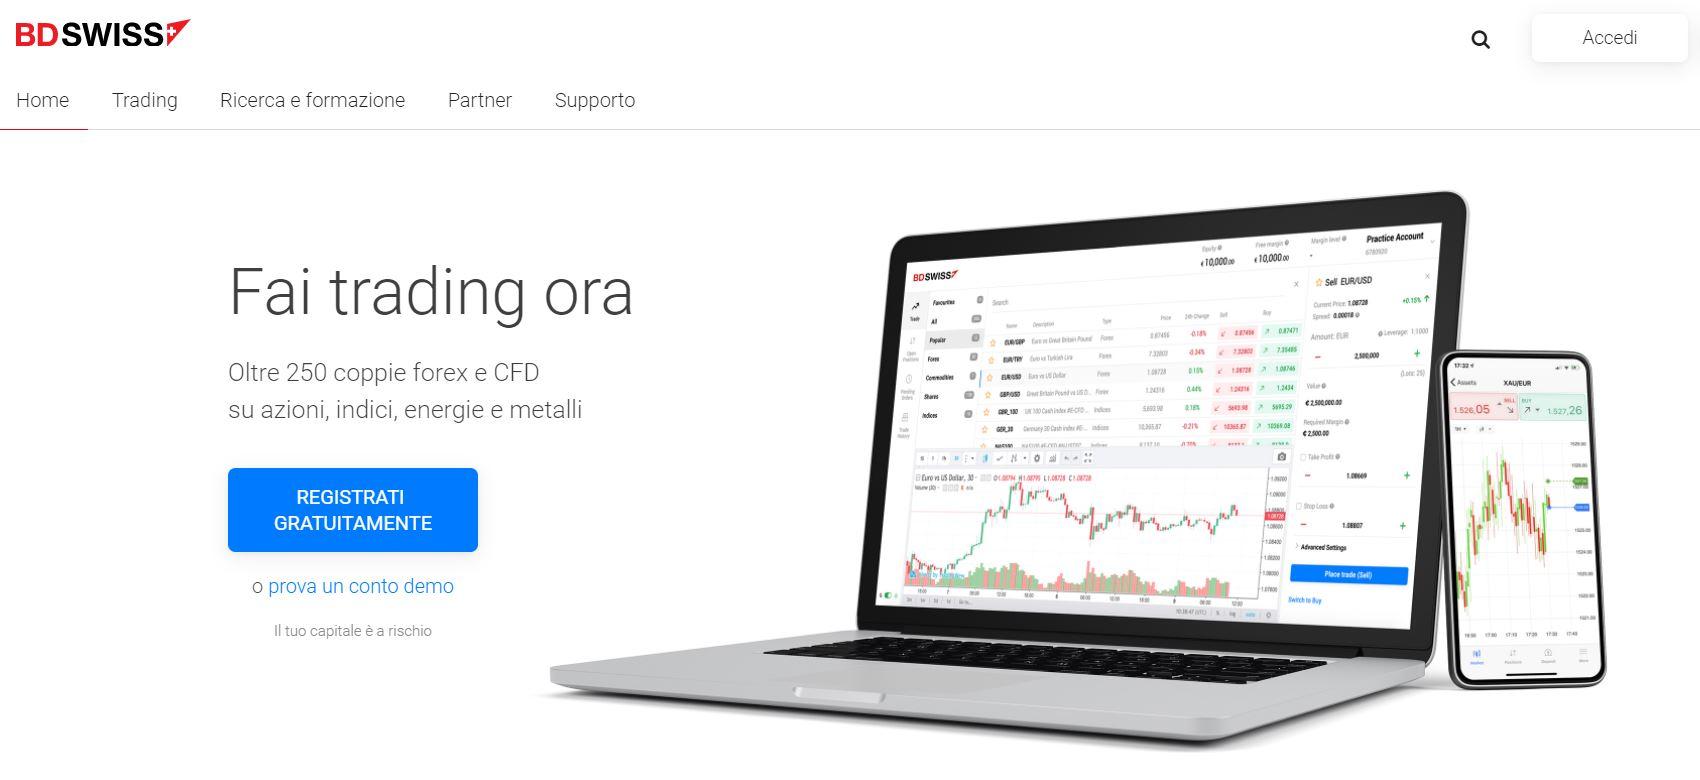 demo trading online bdswiss